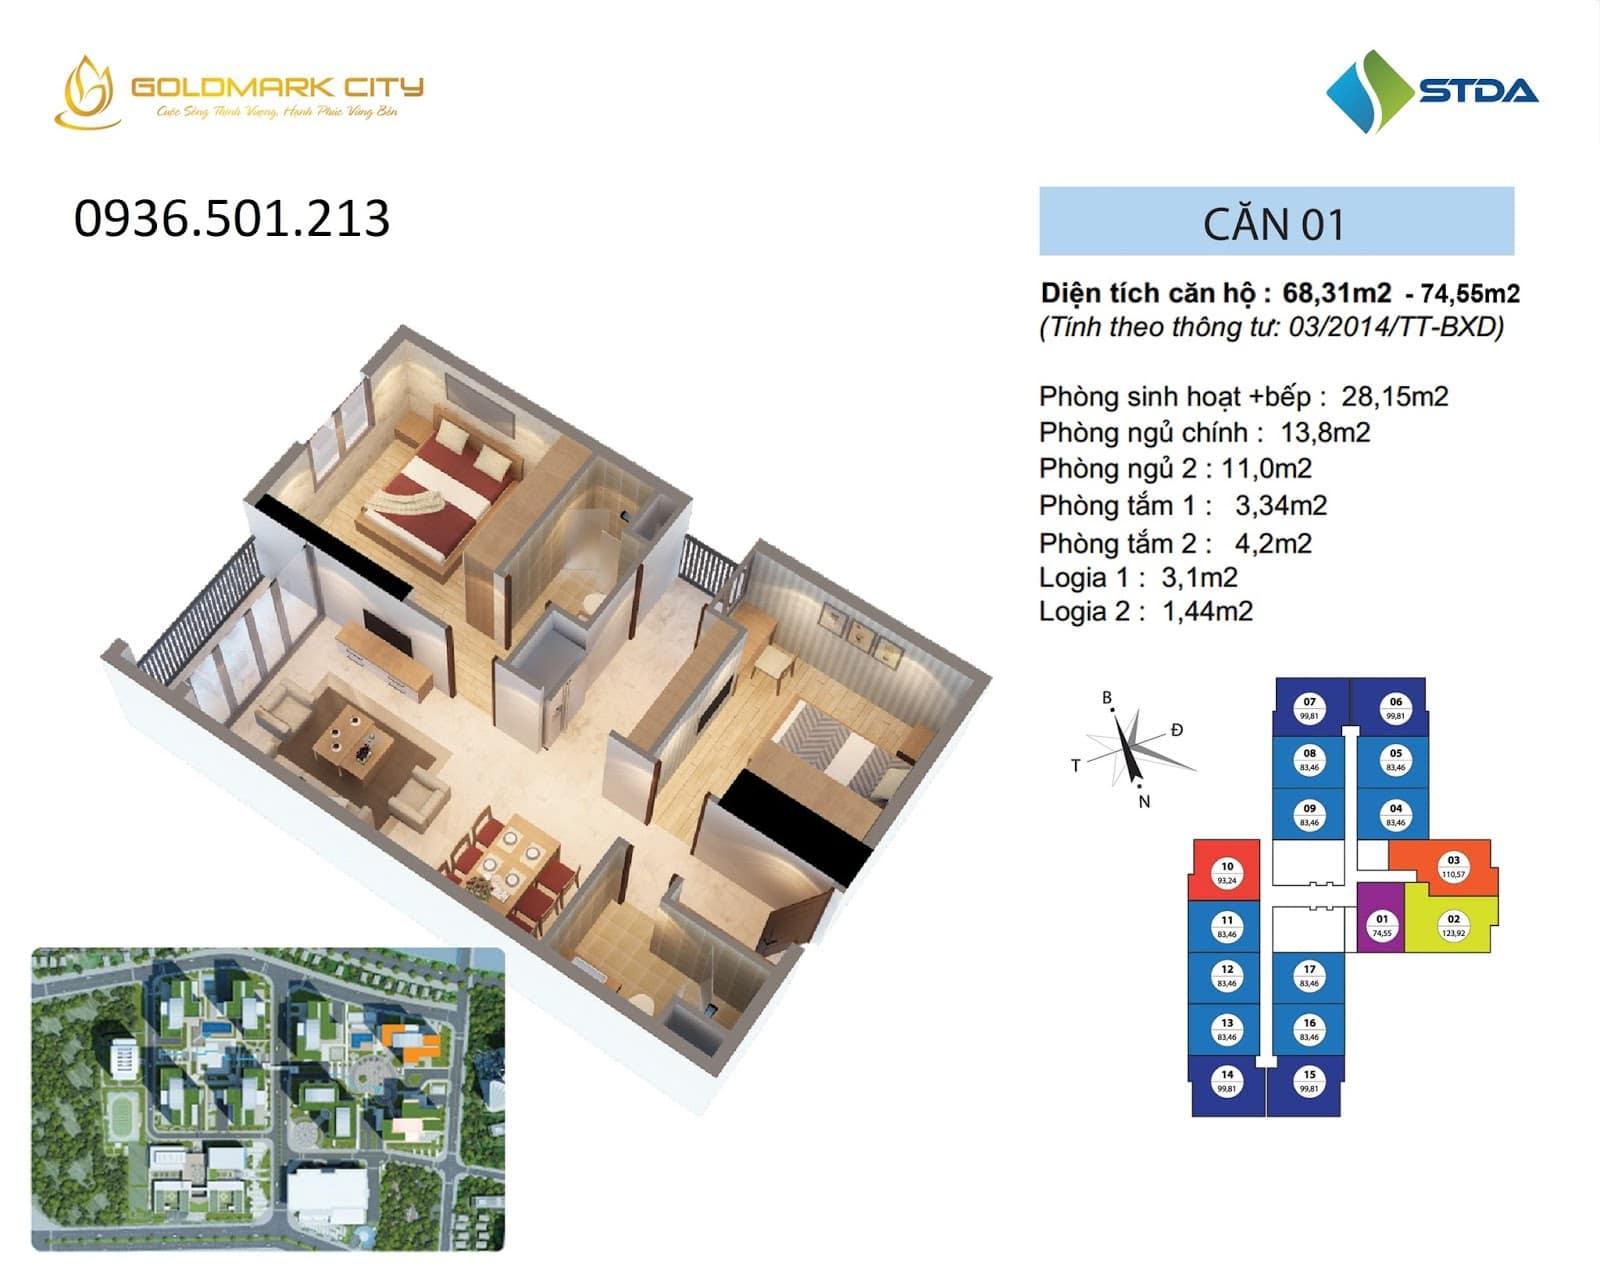 Mặt bằng căn hộ số 01 Ruby 2- Goldmark City 136 Hồ Tùng Mậu